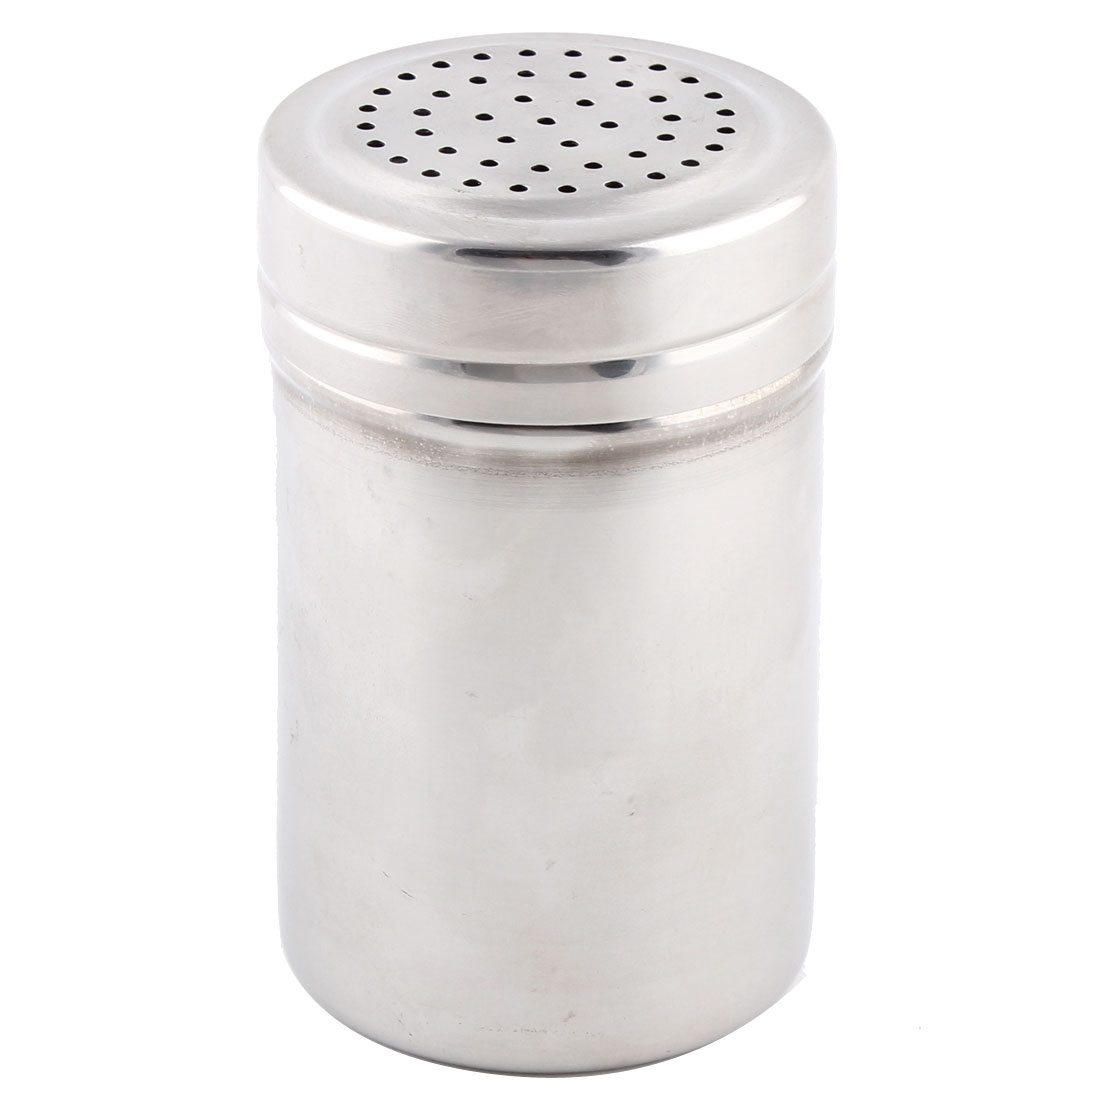 Kitchenware Stainless Steel Multi Holes Outlet Spice Salt Pepper Shaker Cruet Bottle 3.3 Inch High